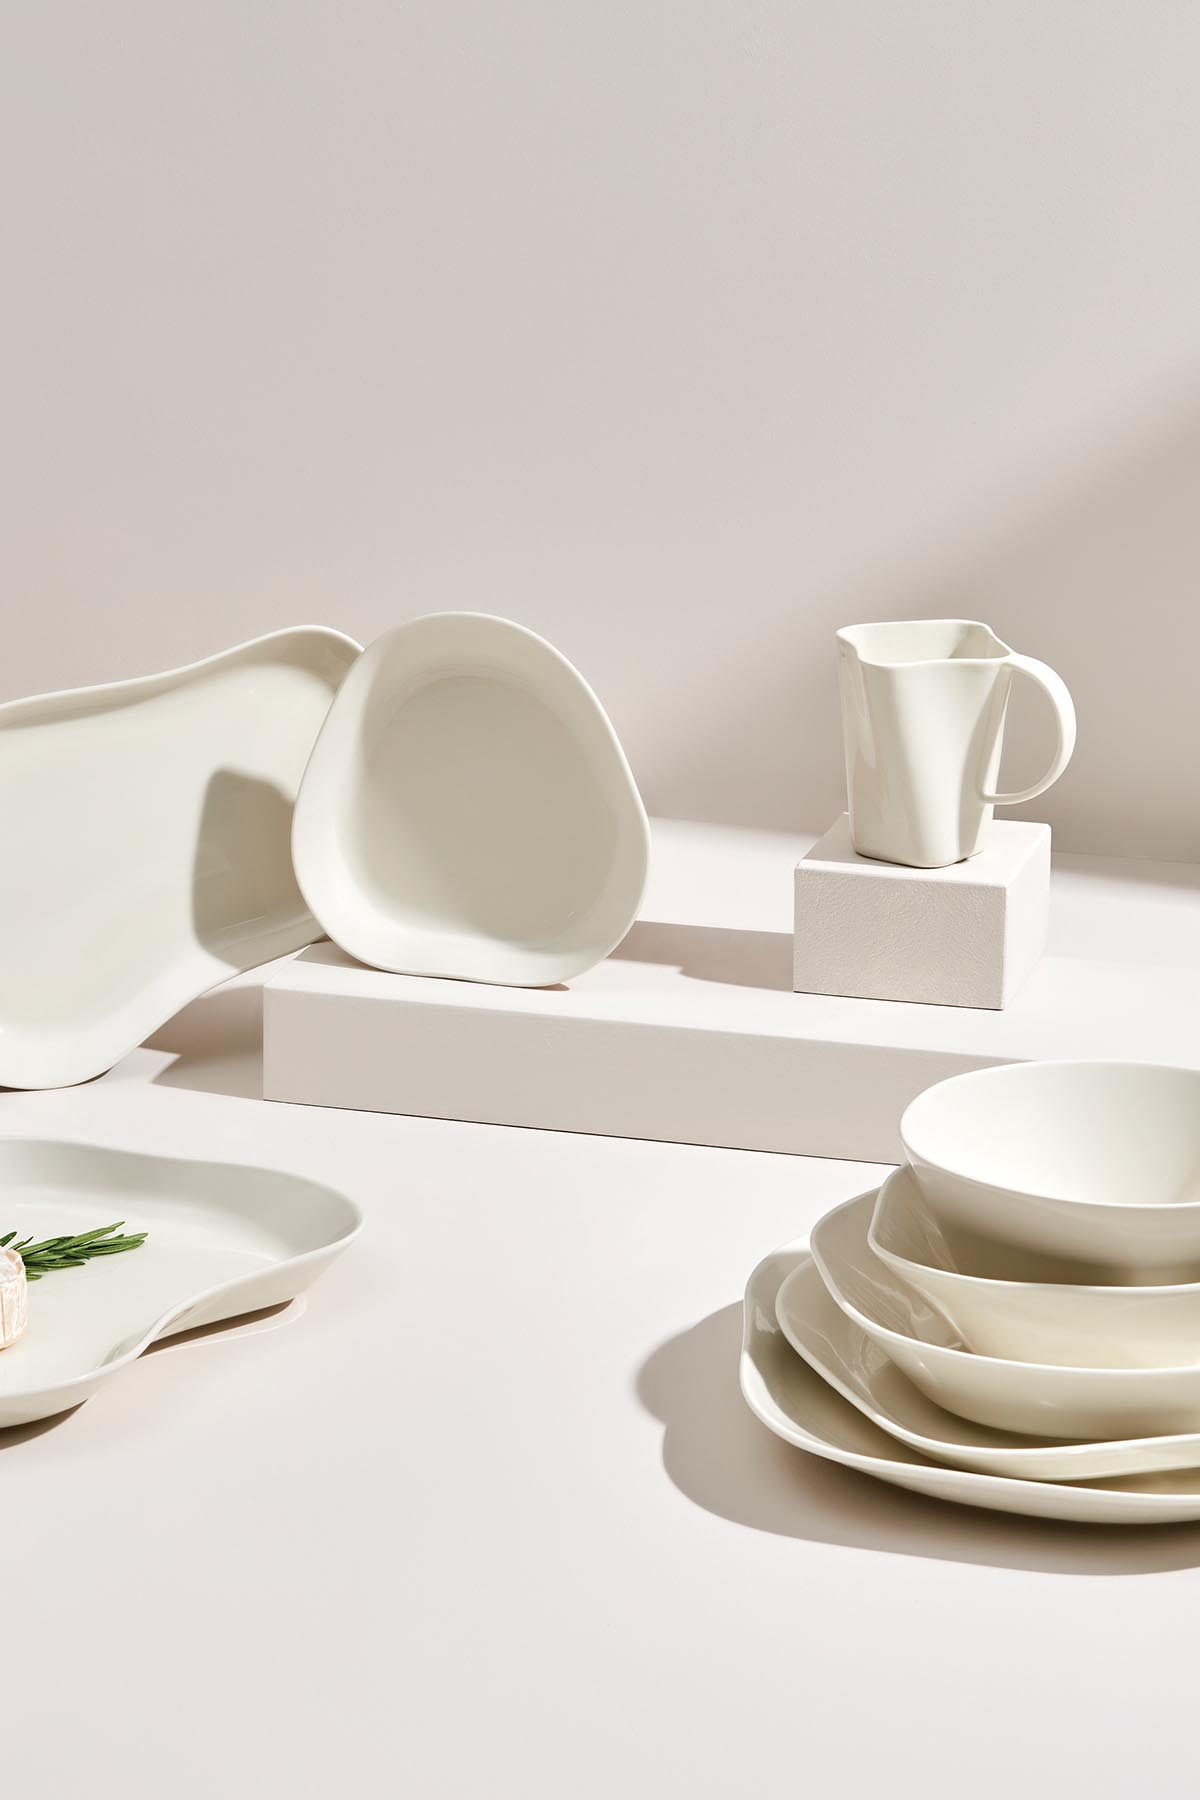 Kütahya Porselen Skallop 2′li 17 cm Küçük Kase Seti Krem